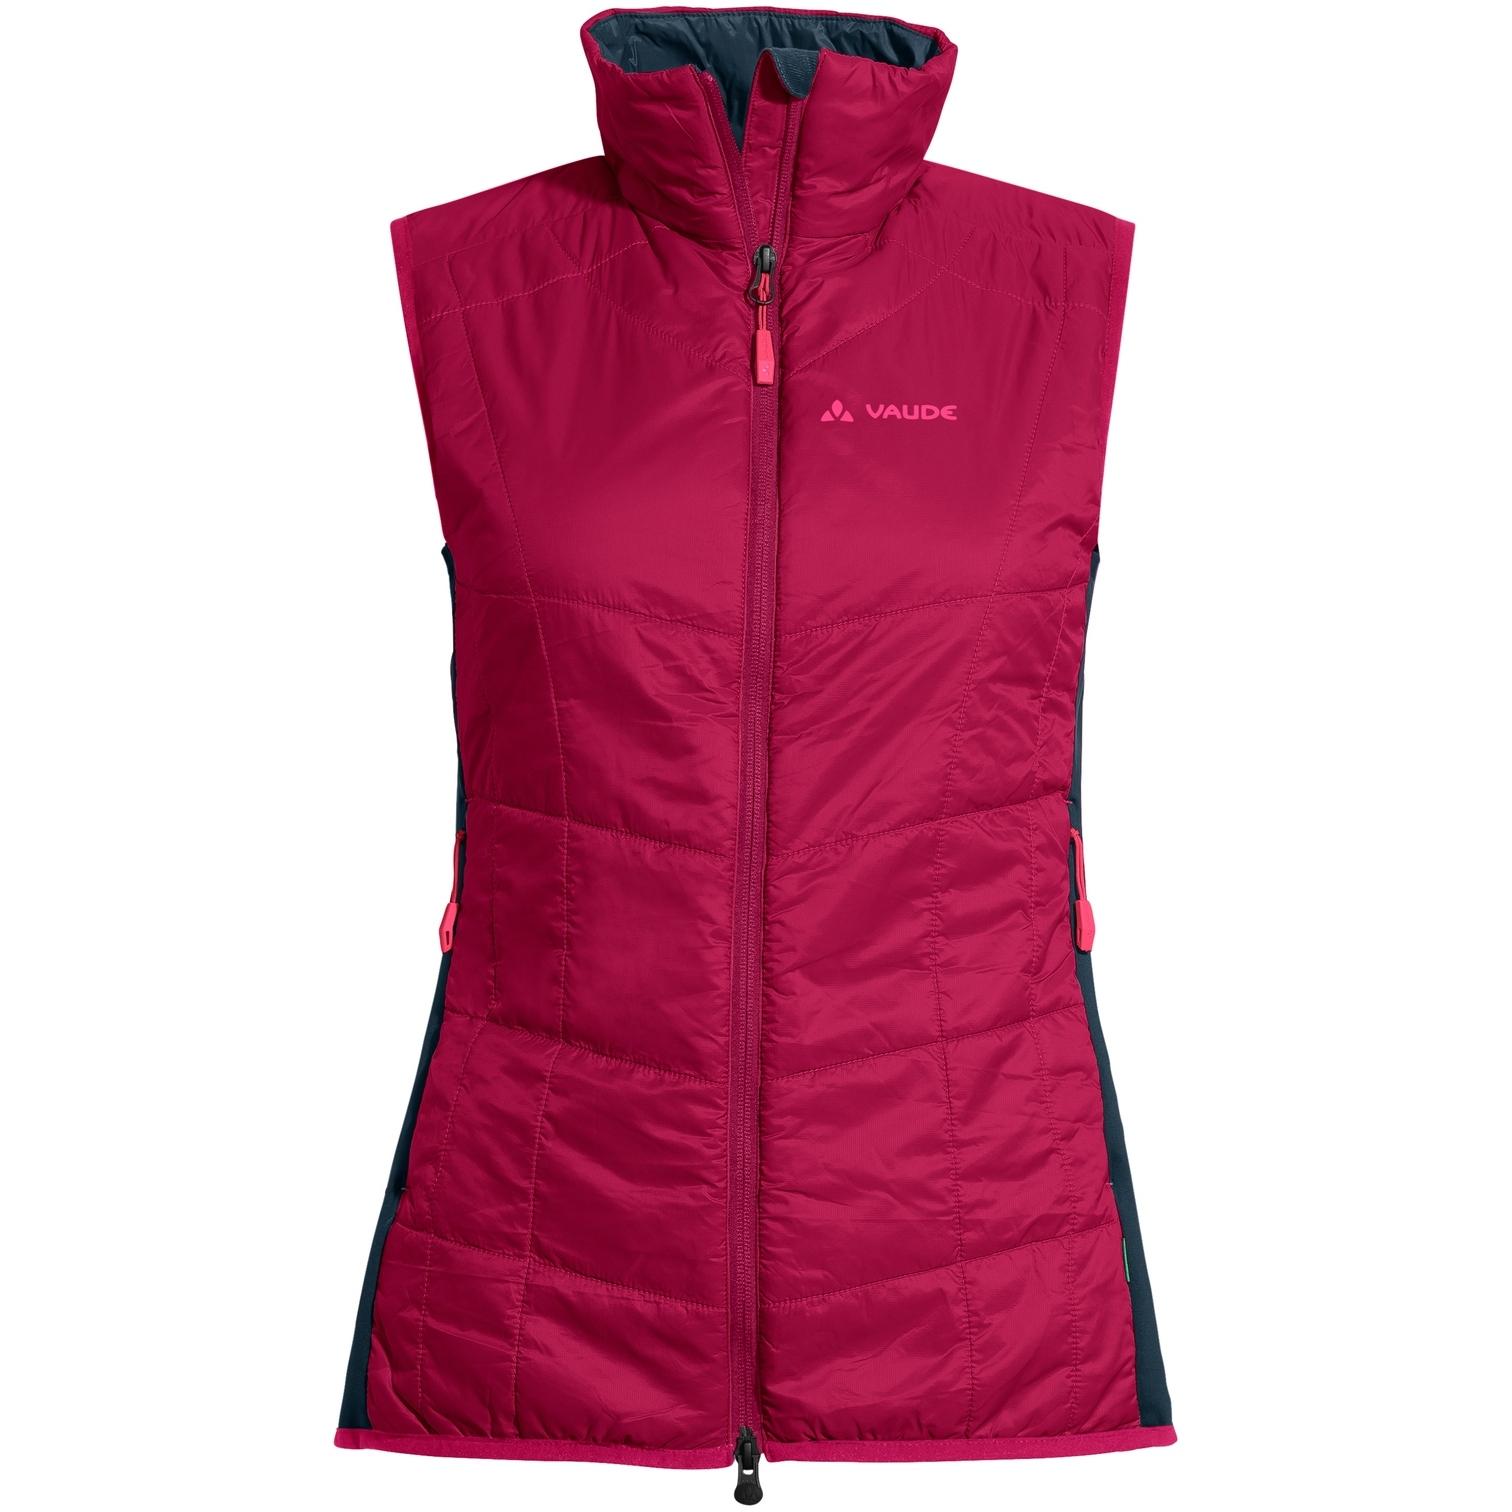 Vaude Women's Sesvenna Vest III - crimson red